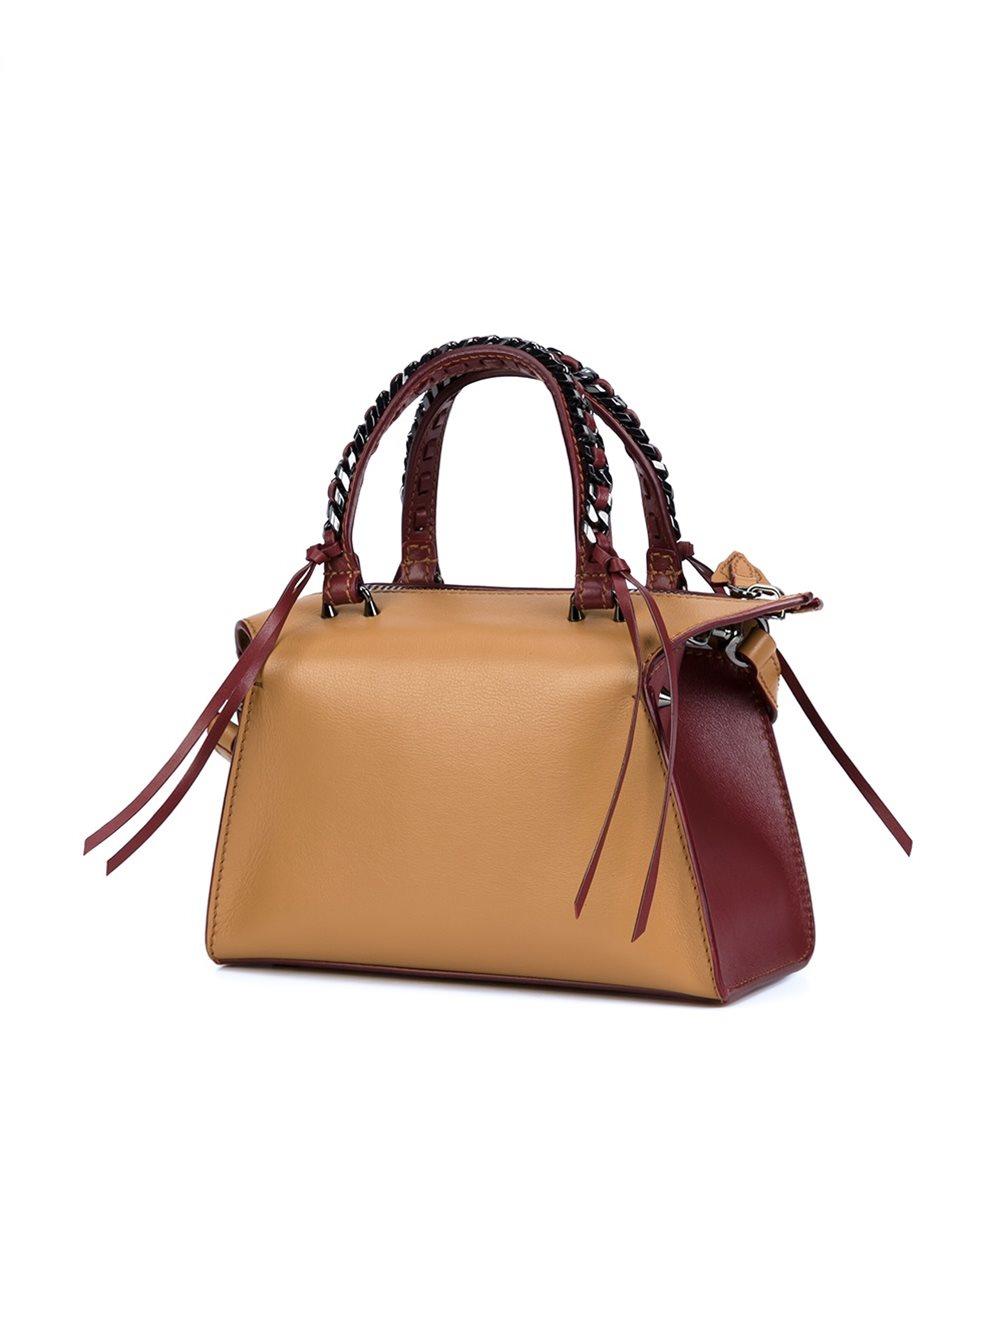 Elena Ghisellini Leather Mini 'gabria' Tote